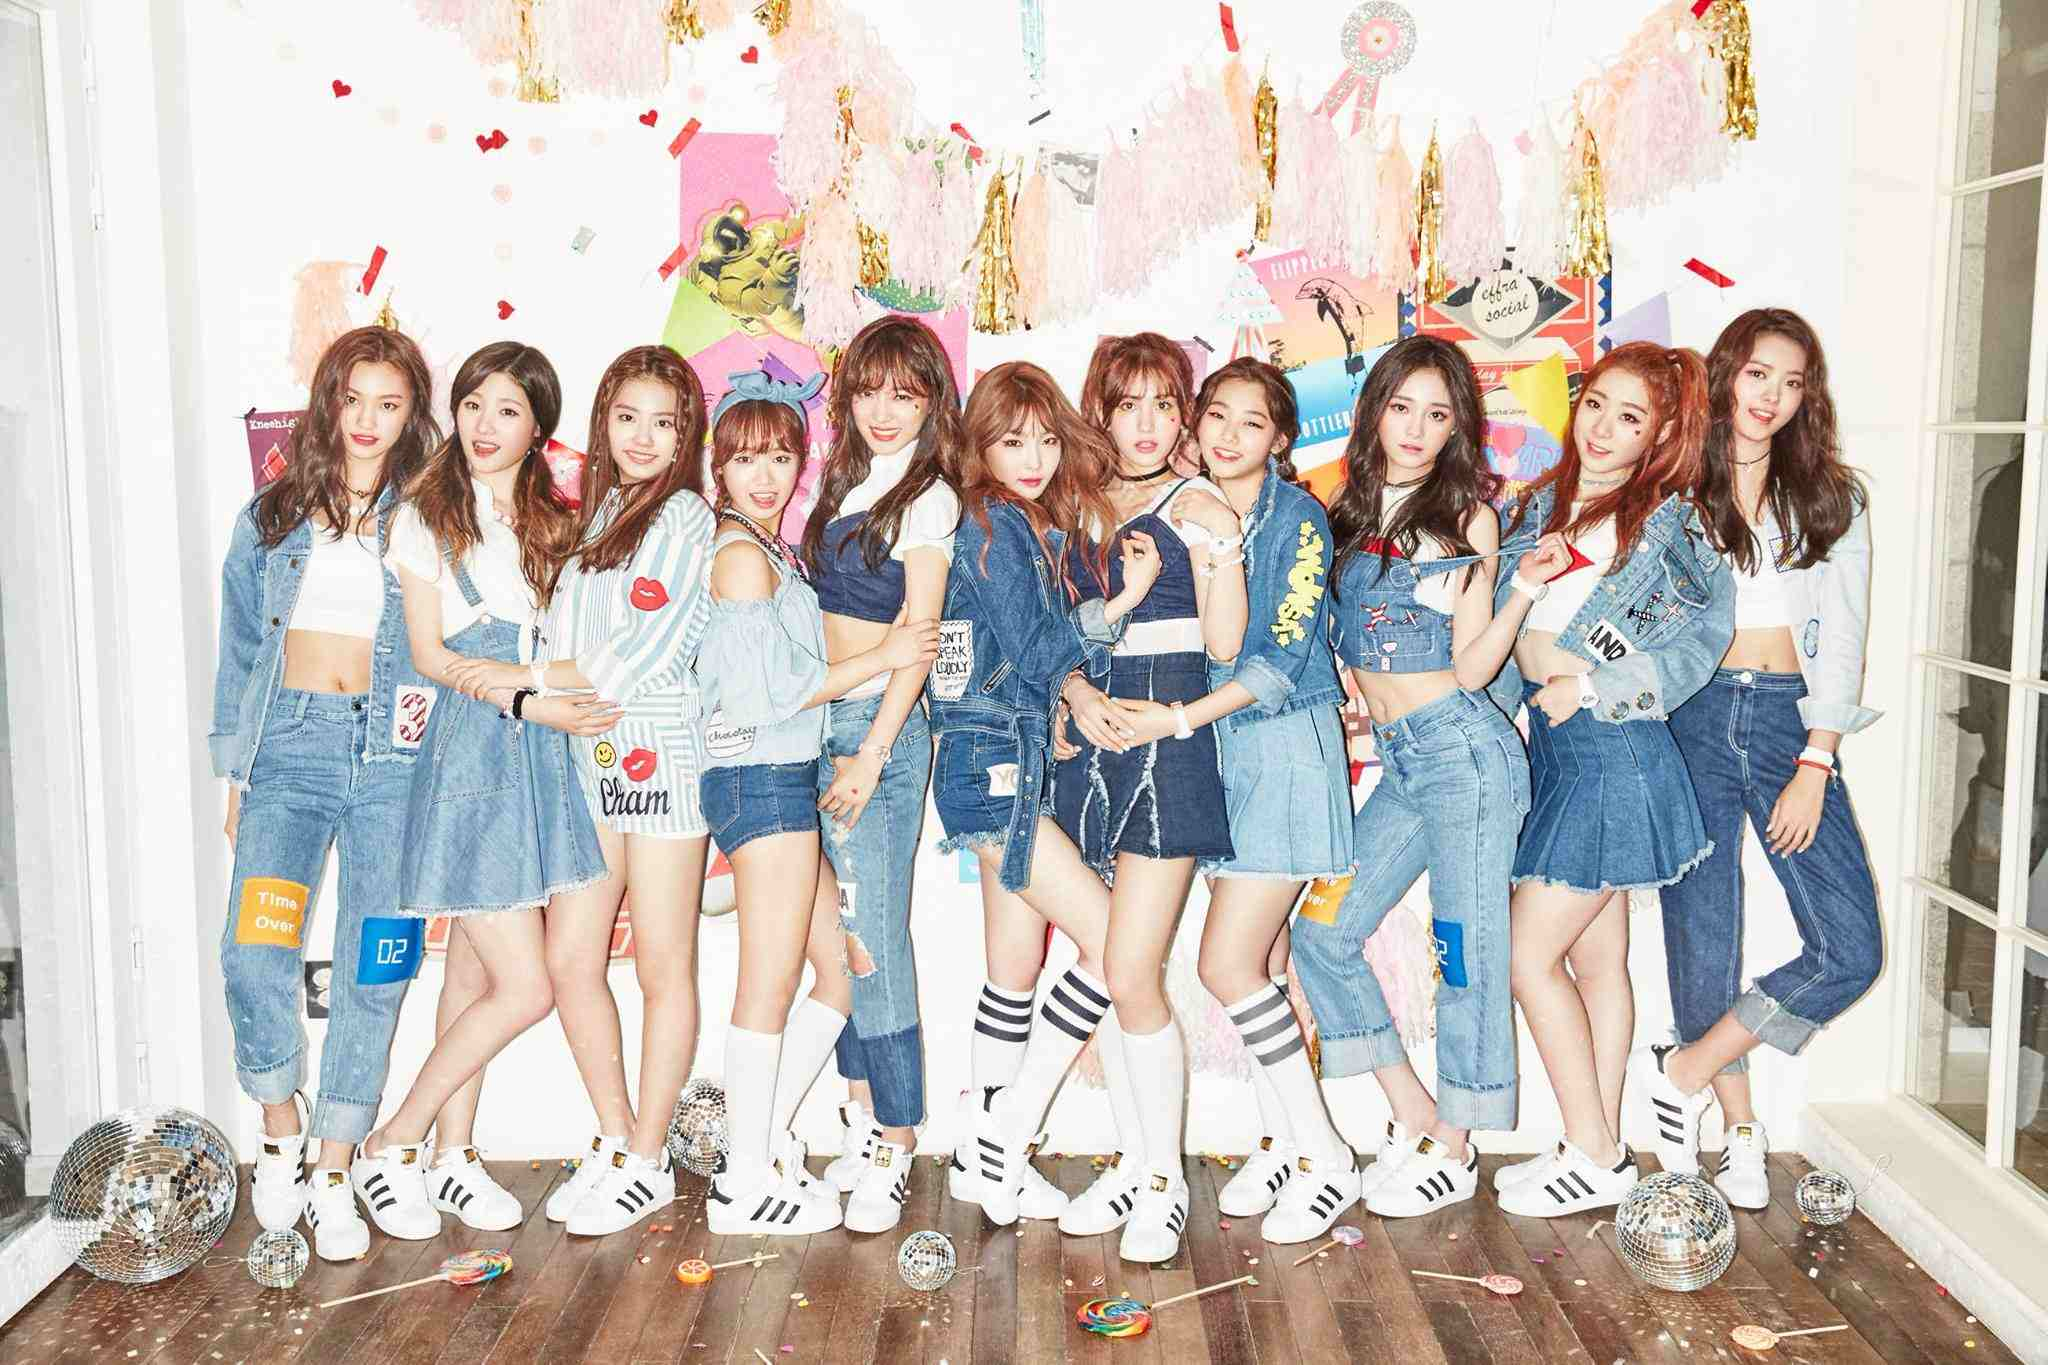 I.O.I 於2016年5月4日正式出道,是以投票方式決定出道成員並組團,出道後曾被韓國媒體暱稱為「國民女團」,解散後成員們都回到各自的公司組團出道...